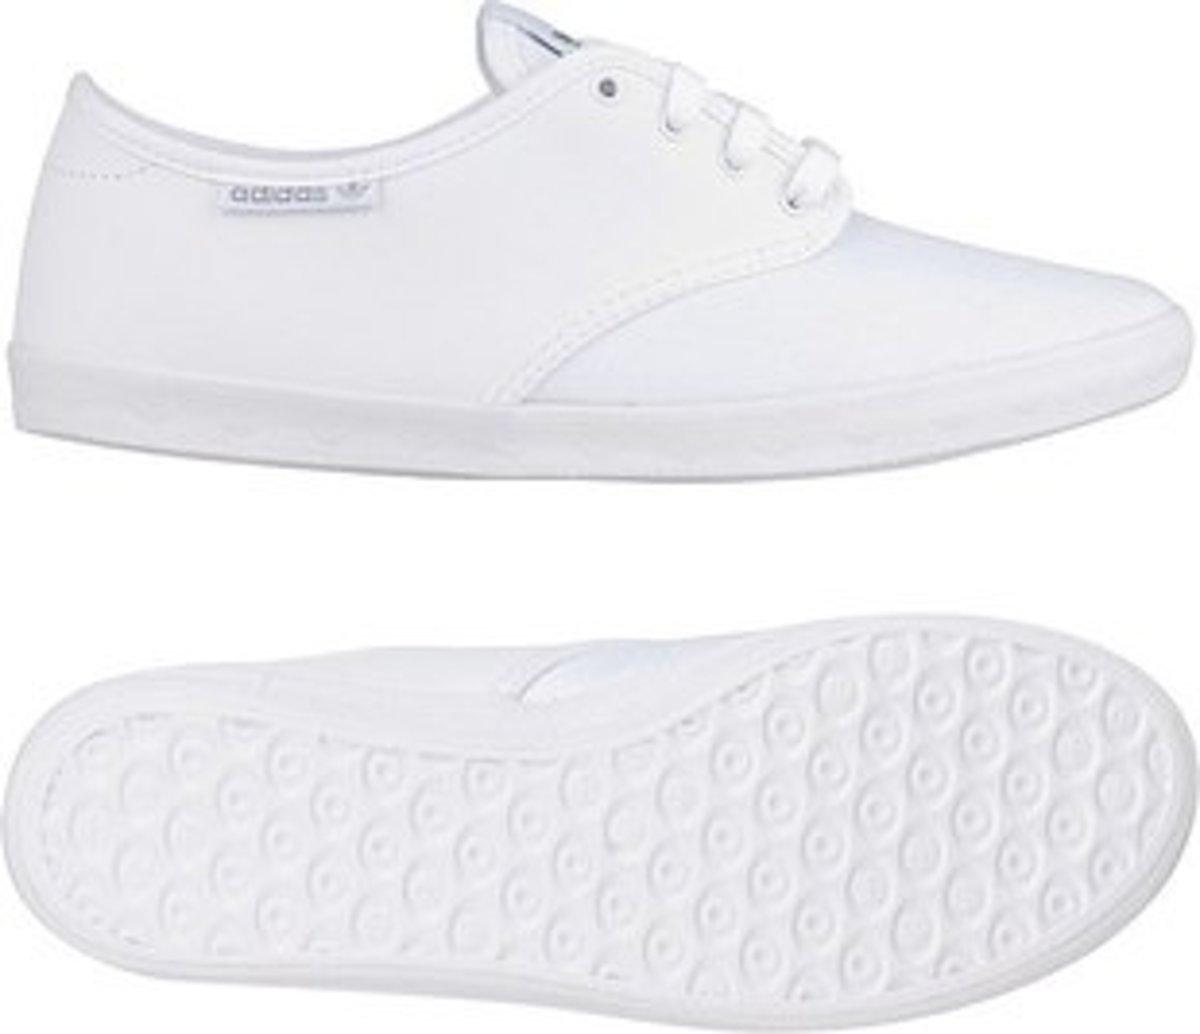 Baskets Adidas Adria Ps Unisexe Blanc Taille 43 1/2 6ZYGV